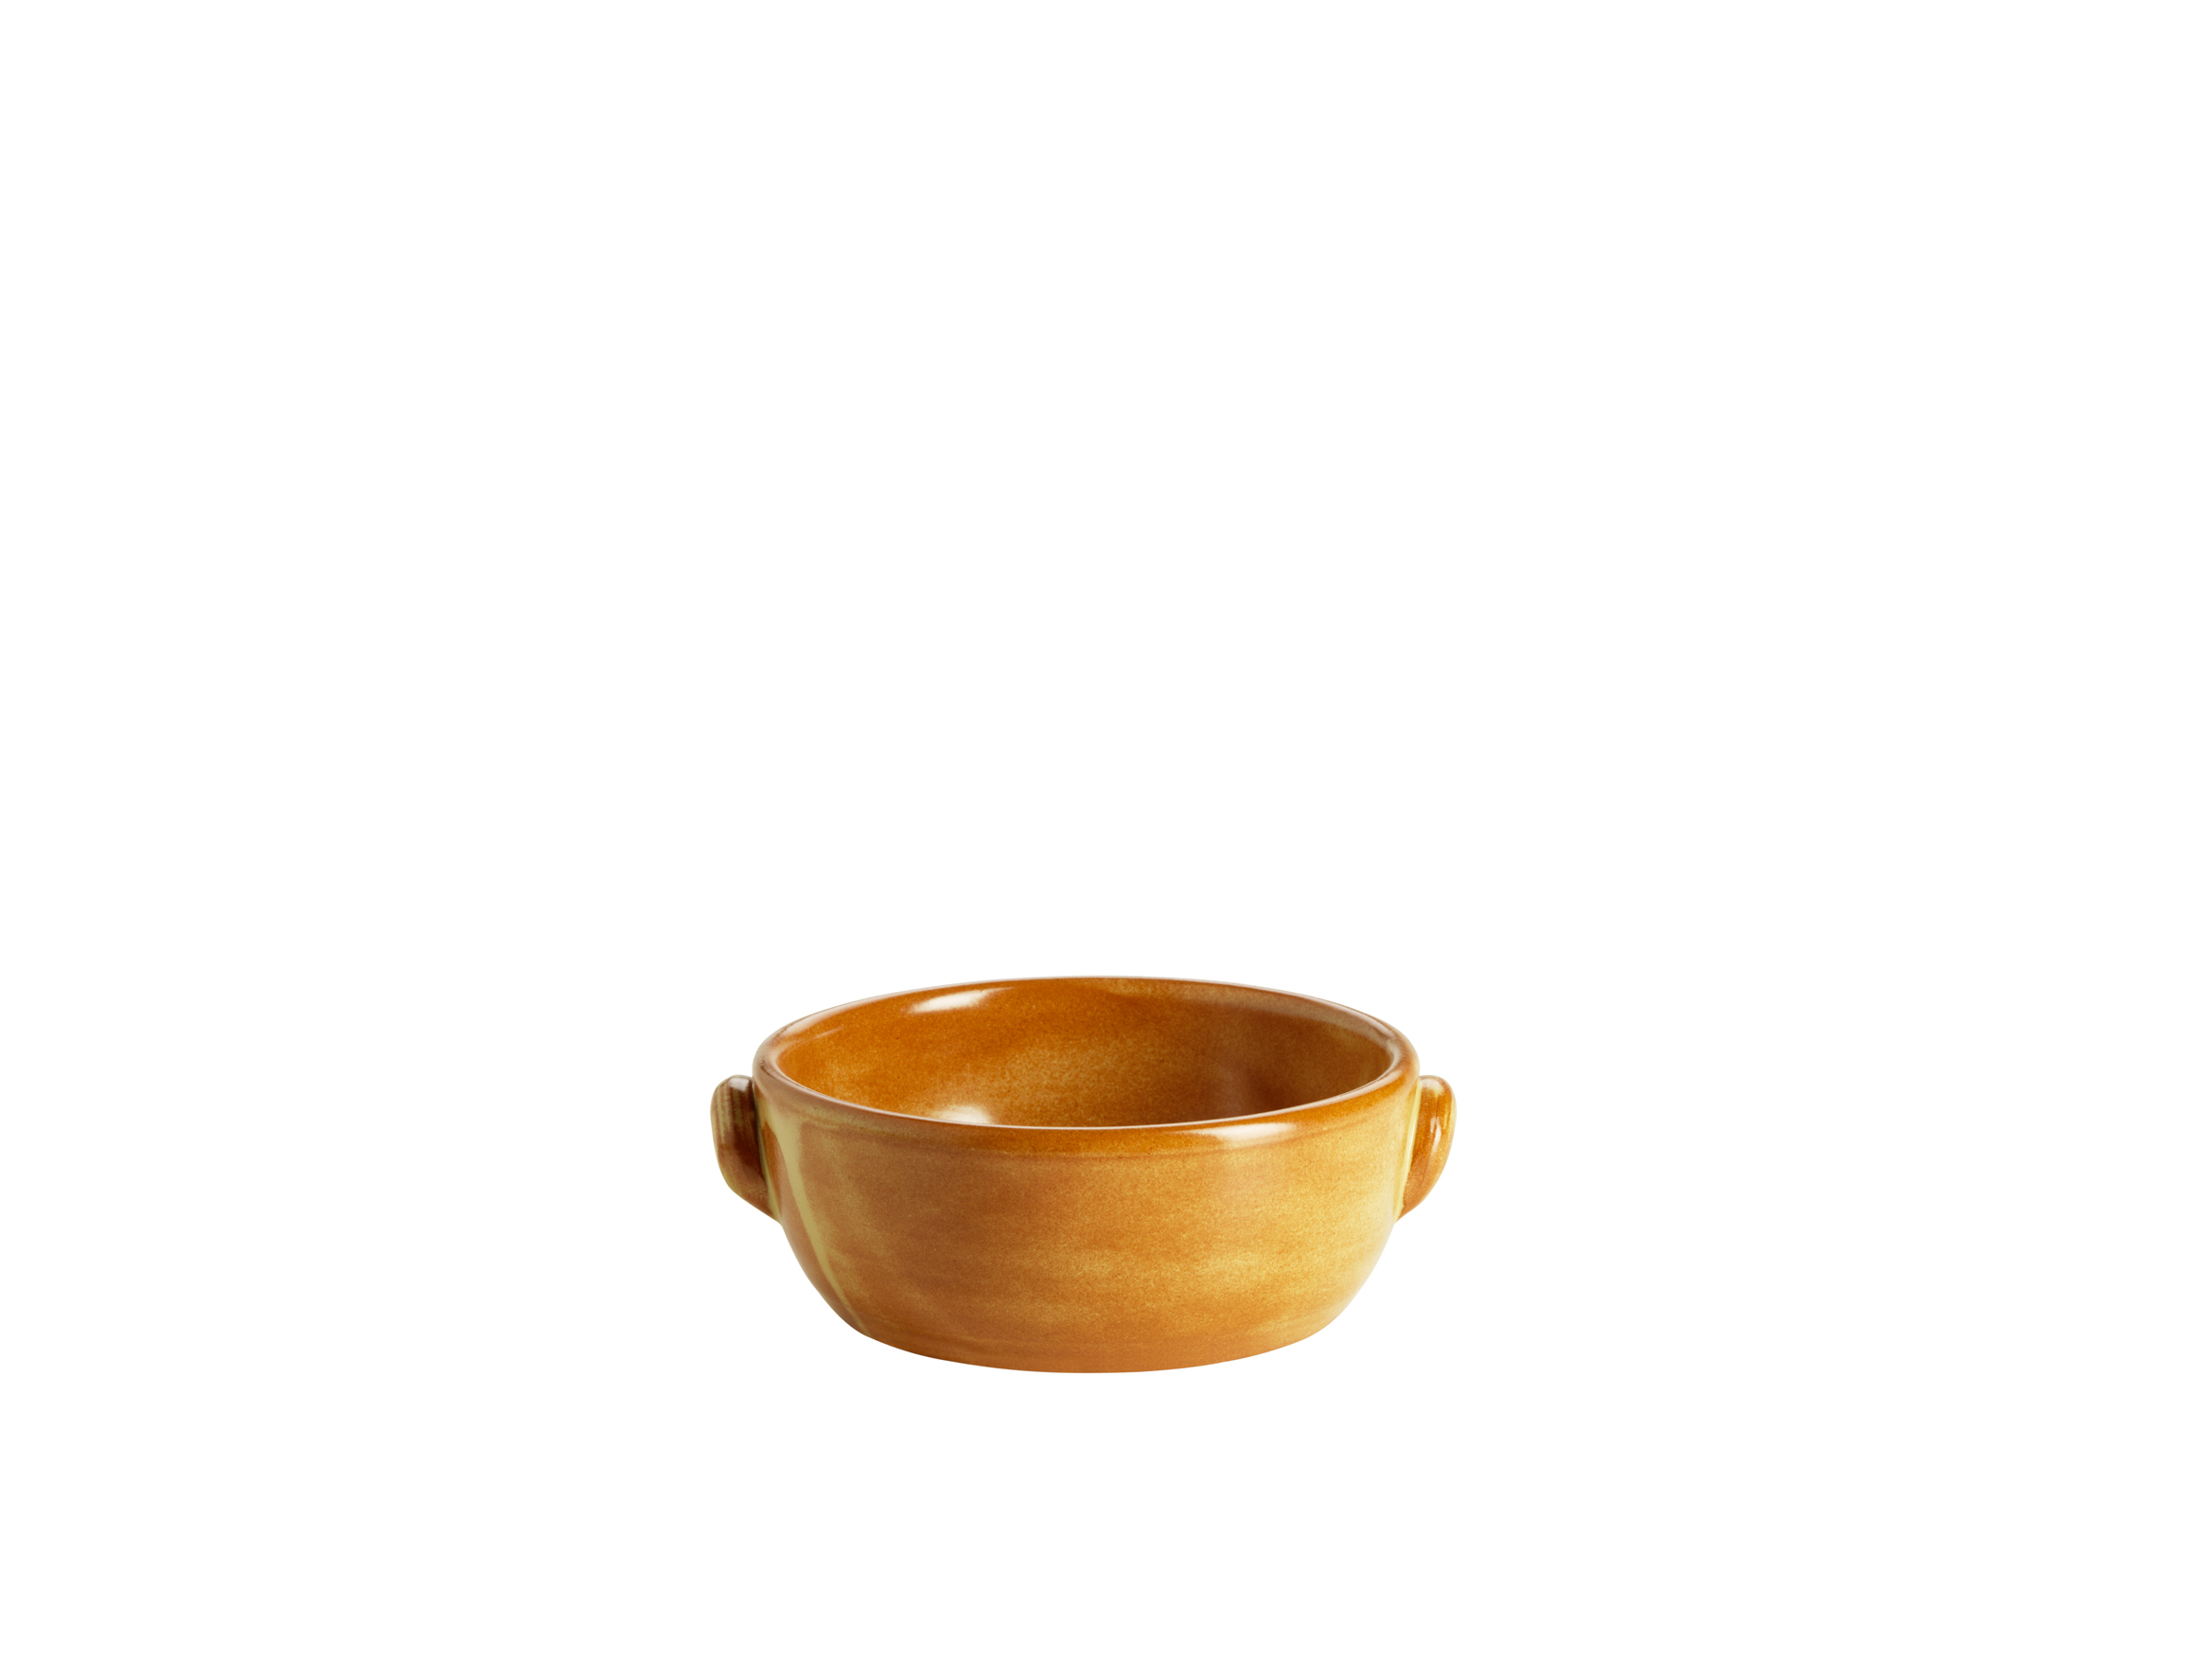 Tiegel 18 cm Keramik Toska Mäser